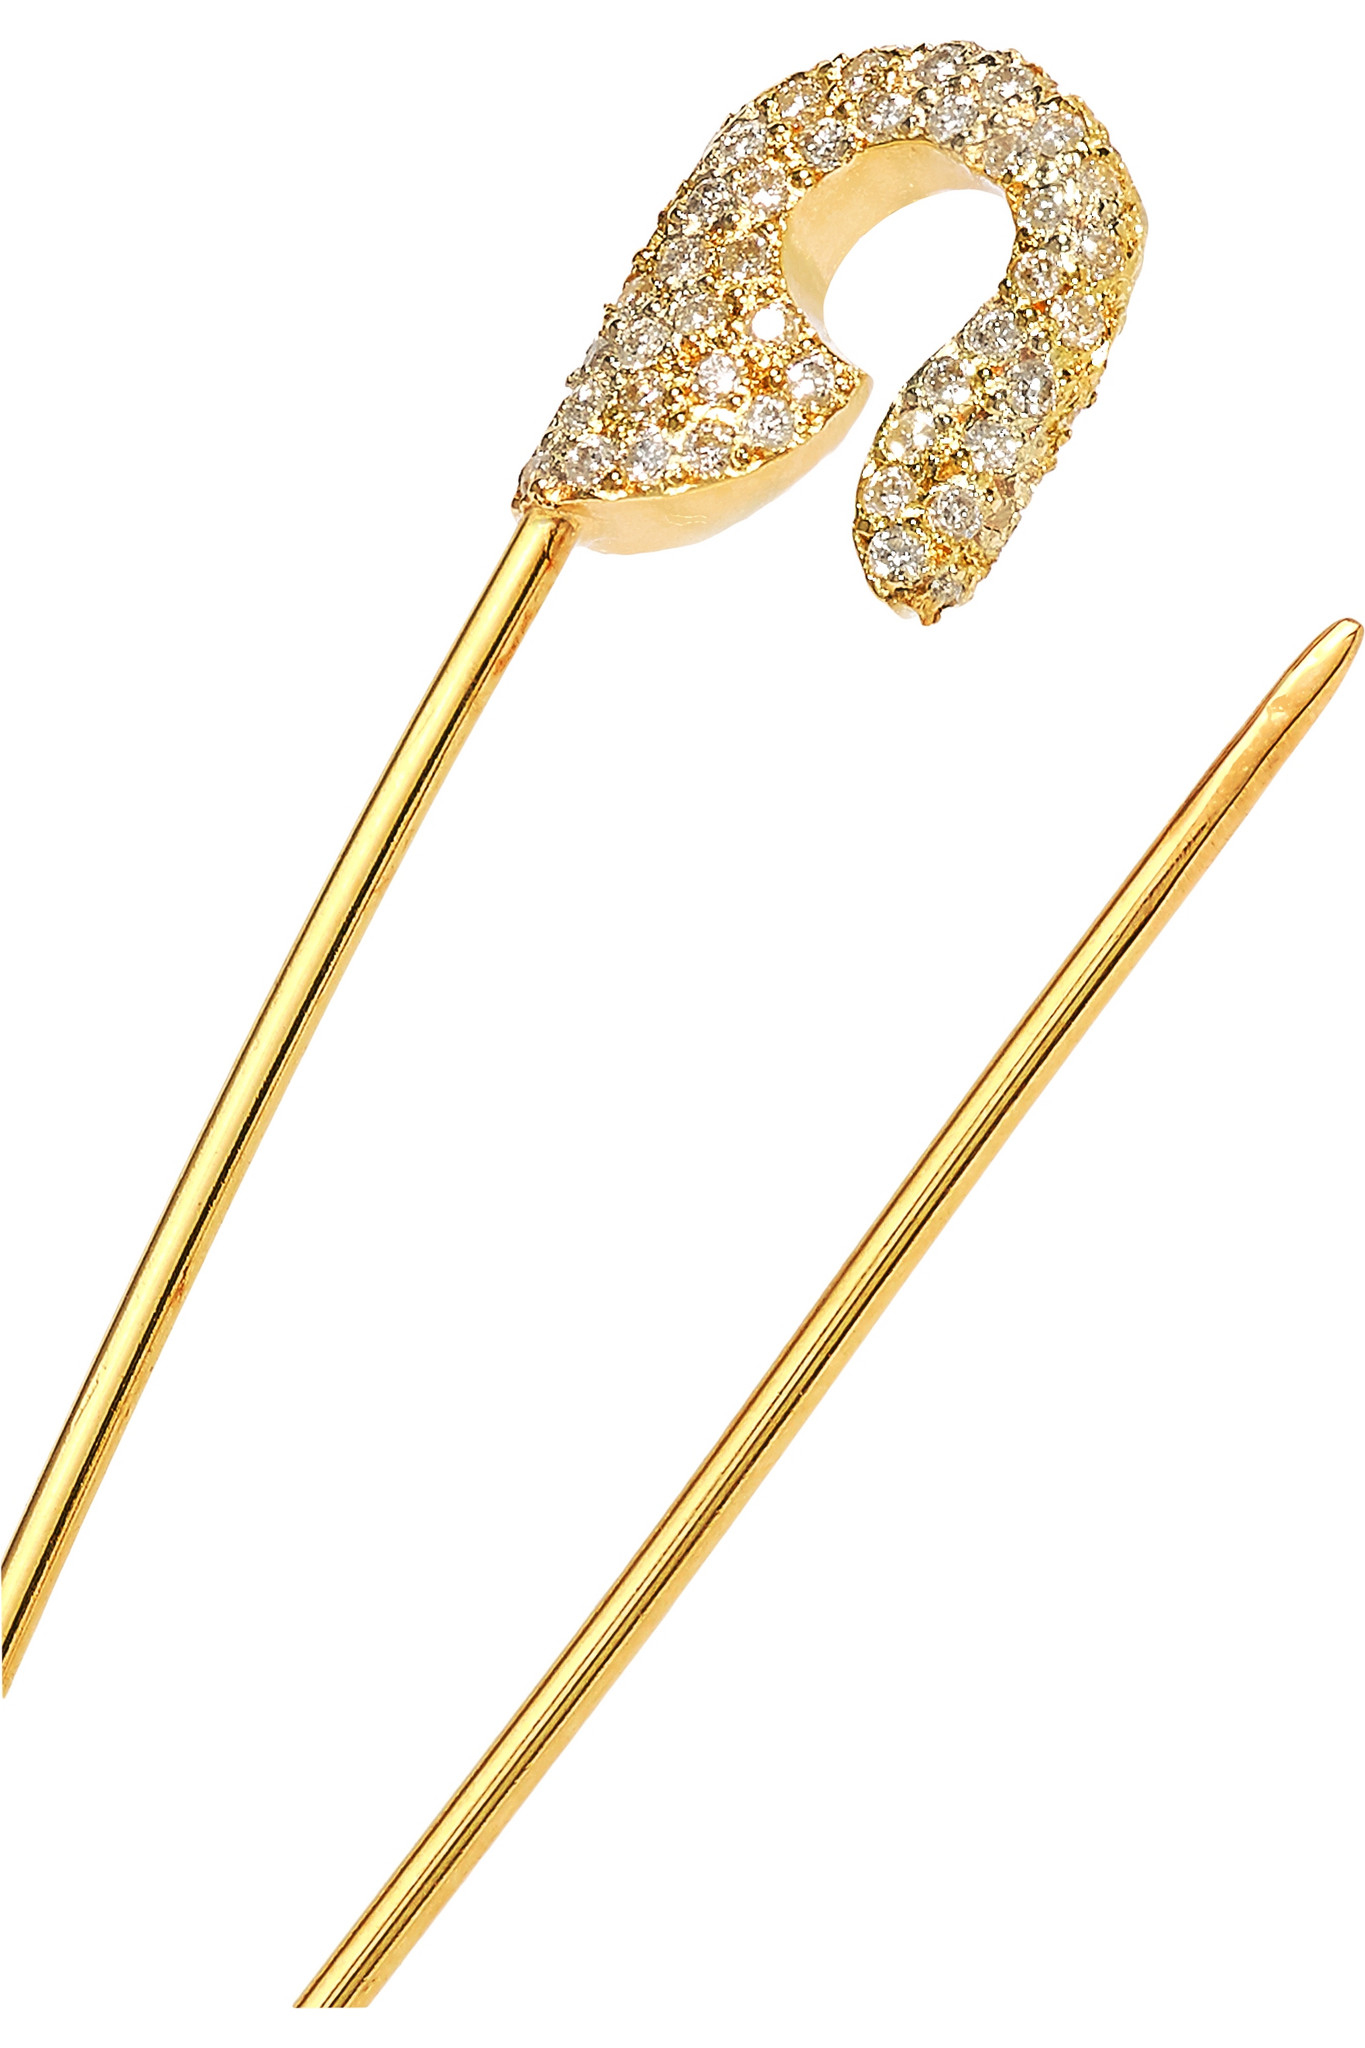 Ileana Makri Safety Pin 18 Karat Gold Diamond Earring In